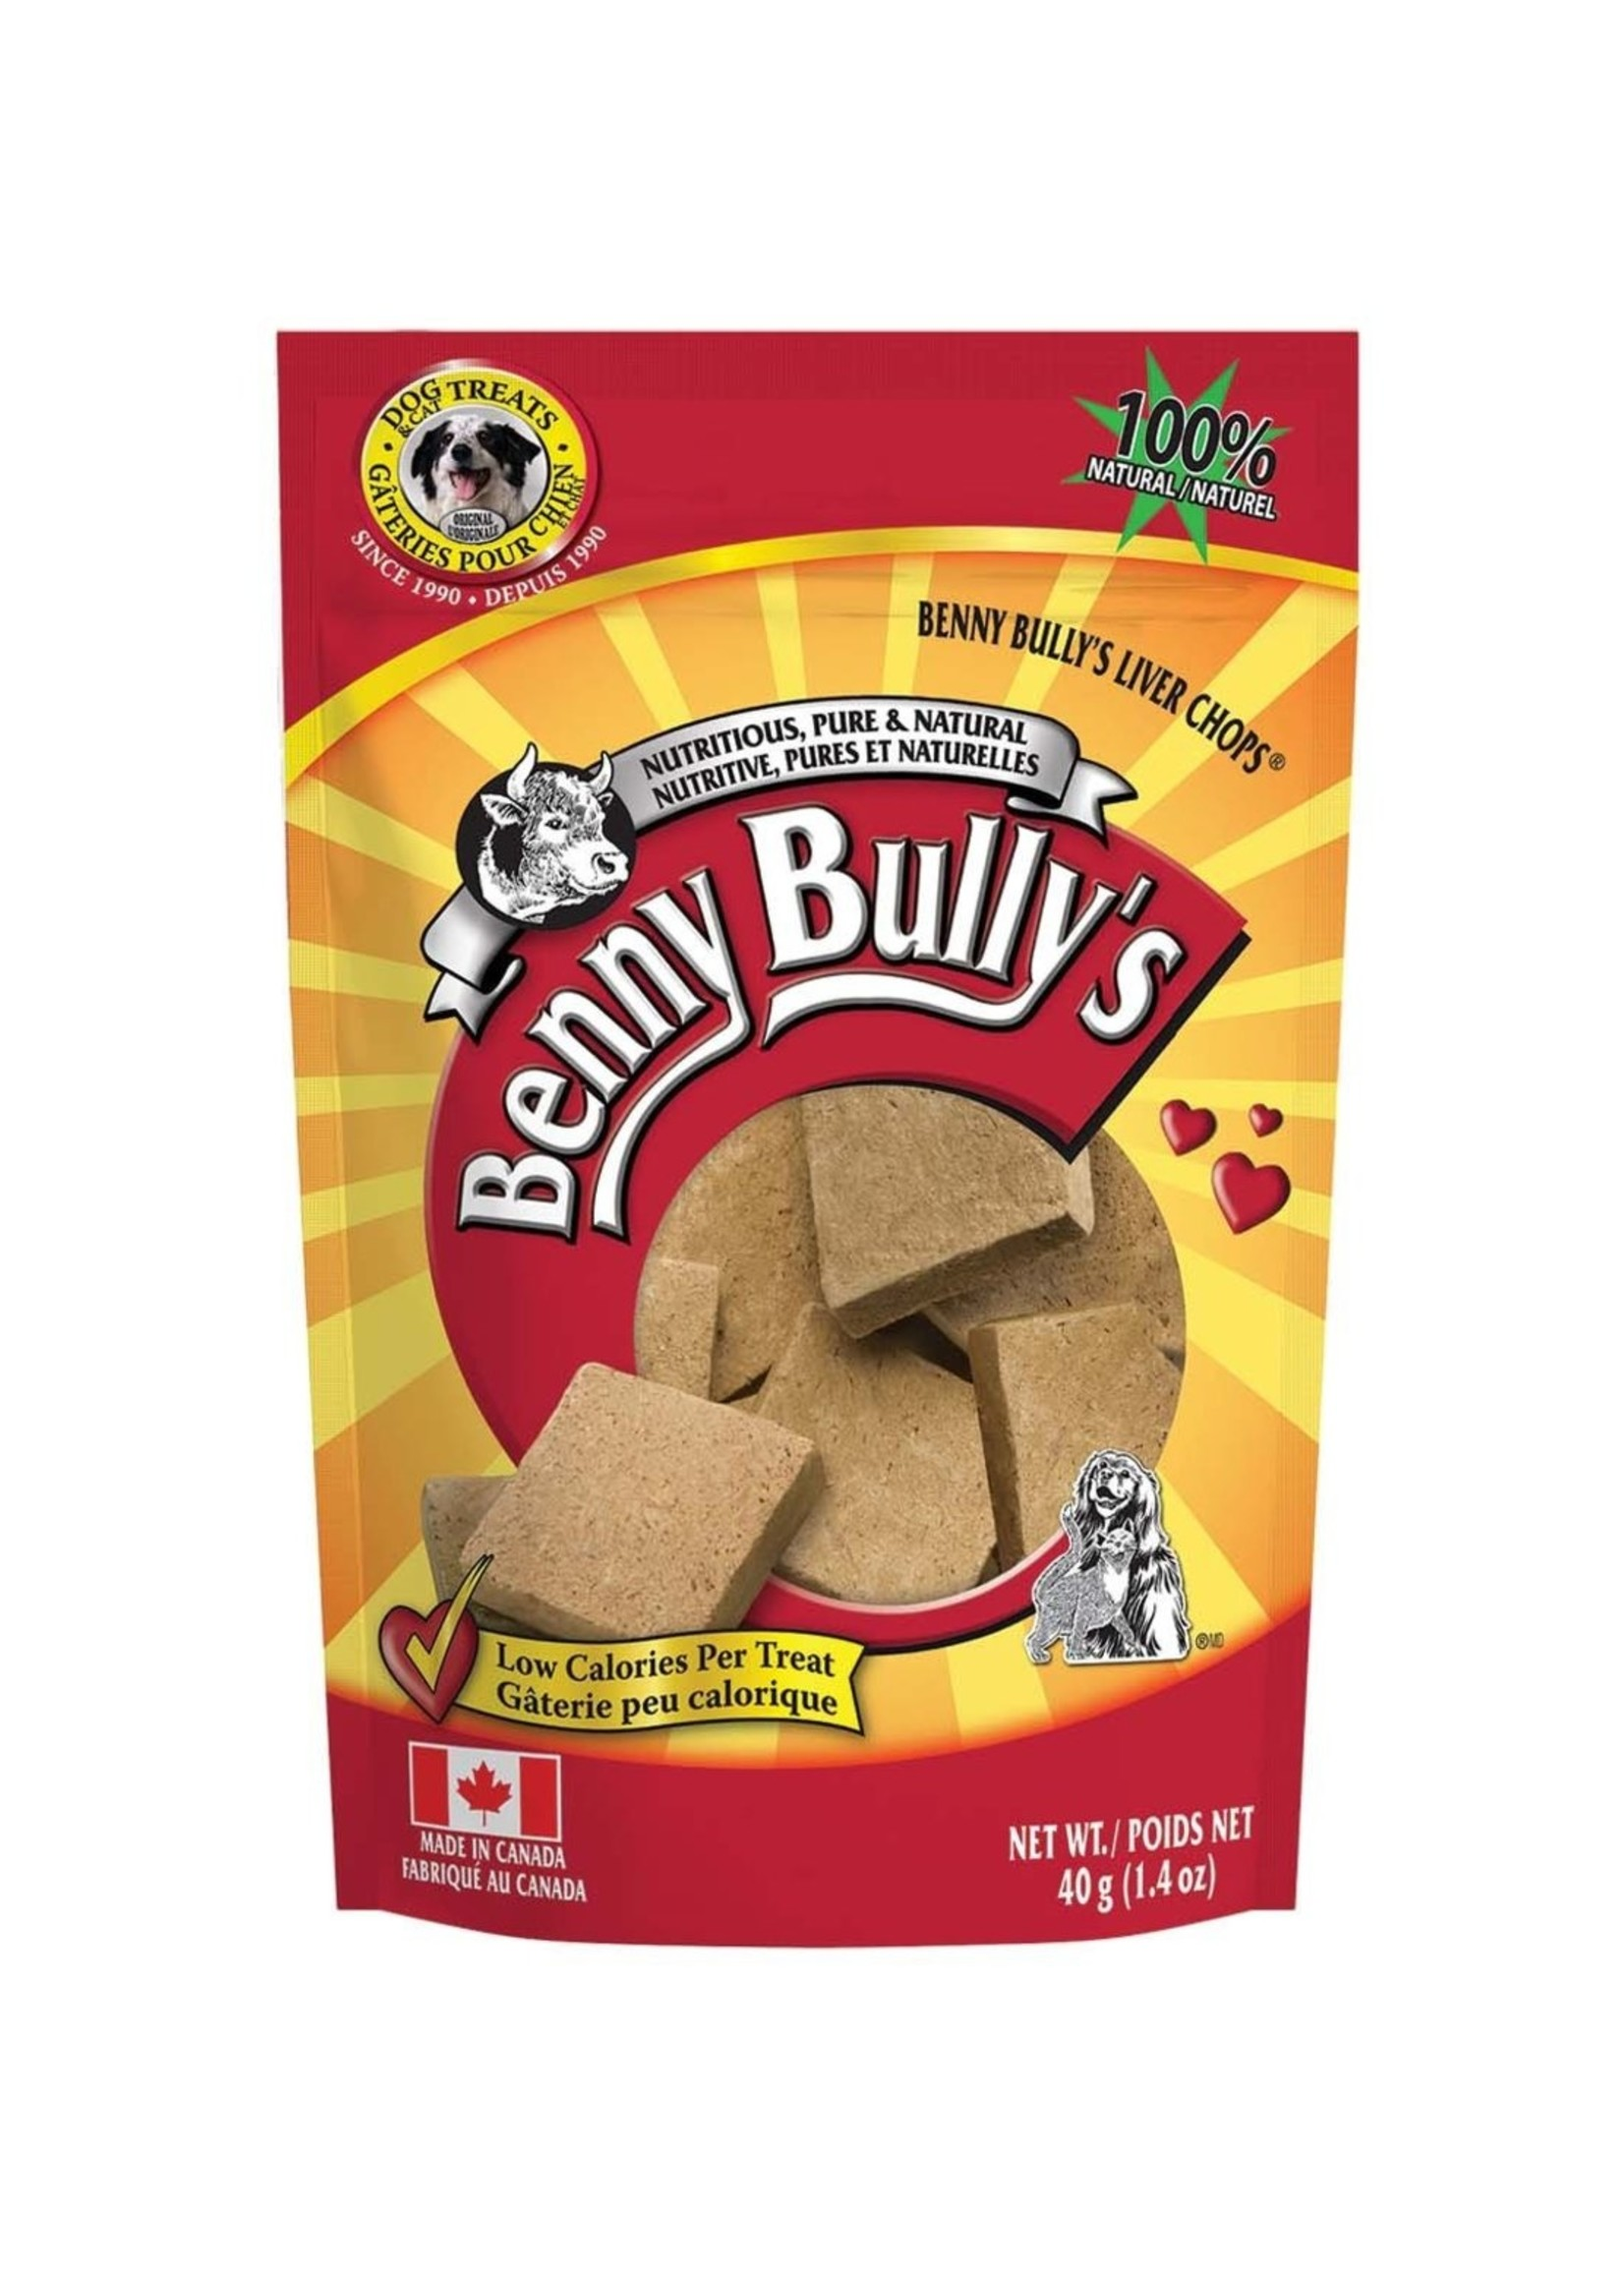 Benny Bullys Liver Chops 40gm